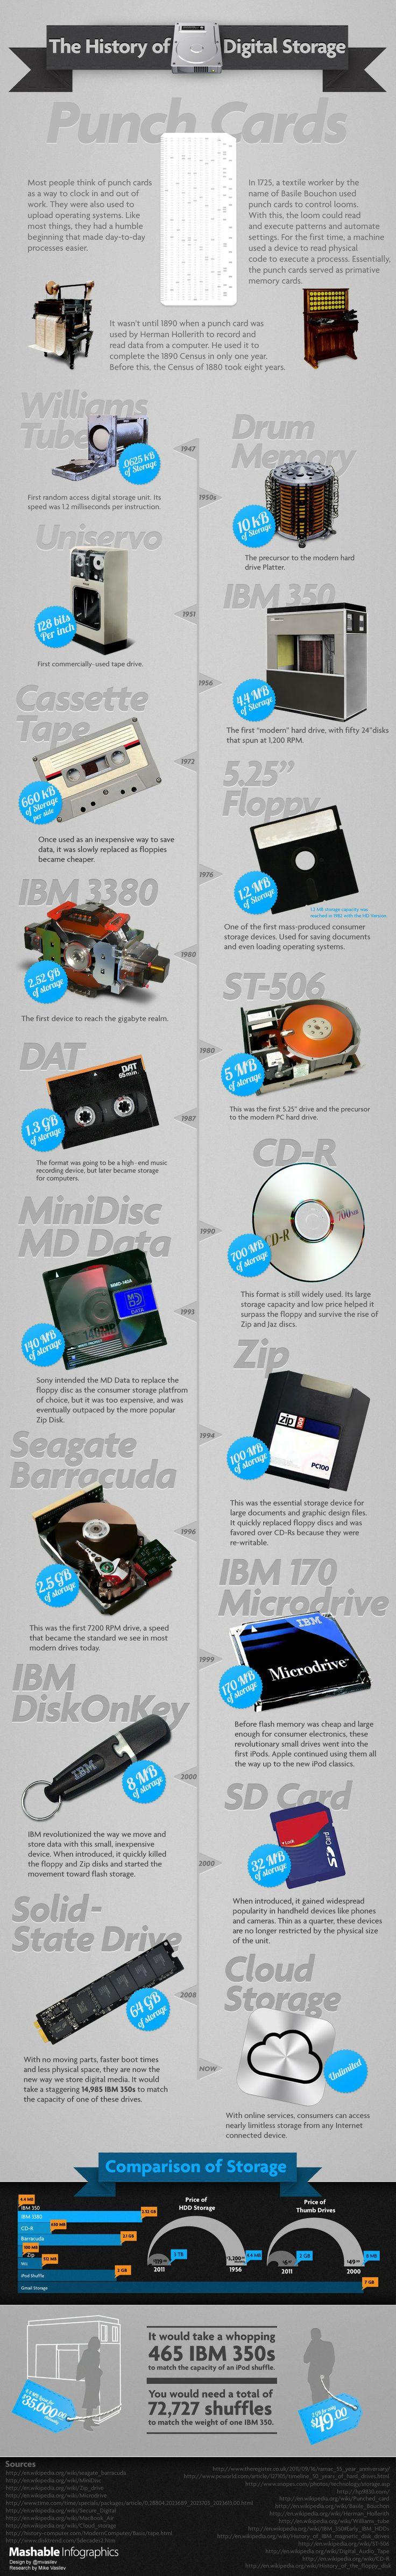 History of Digital Storage Infographic